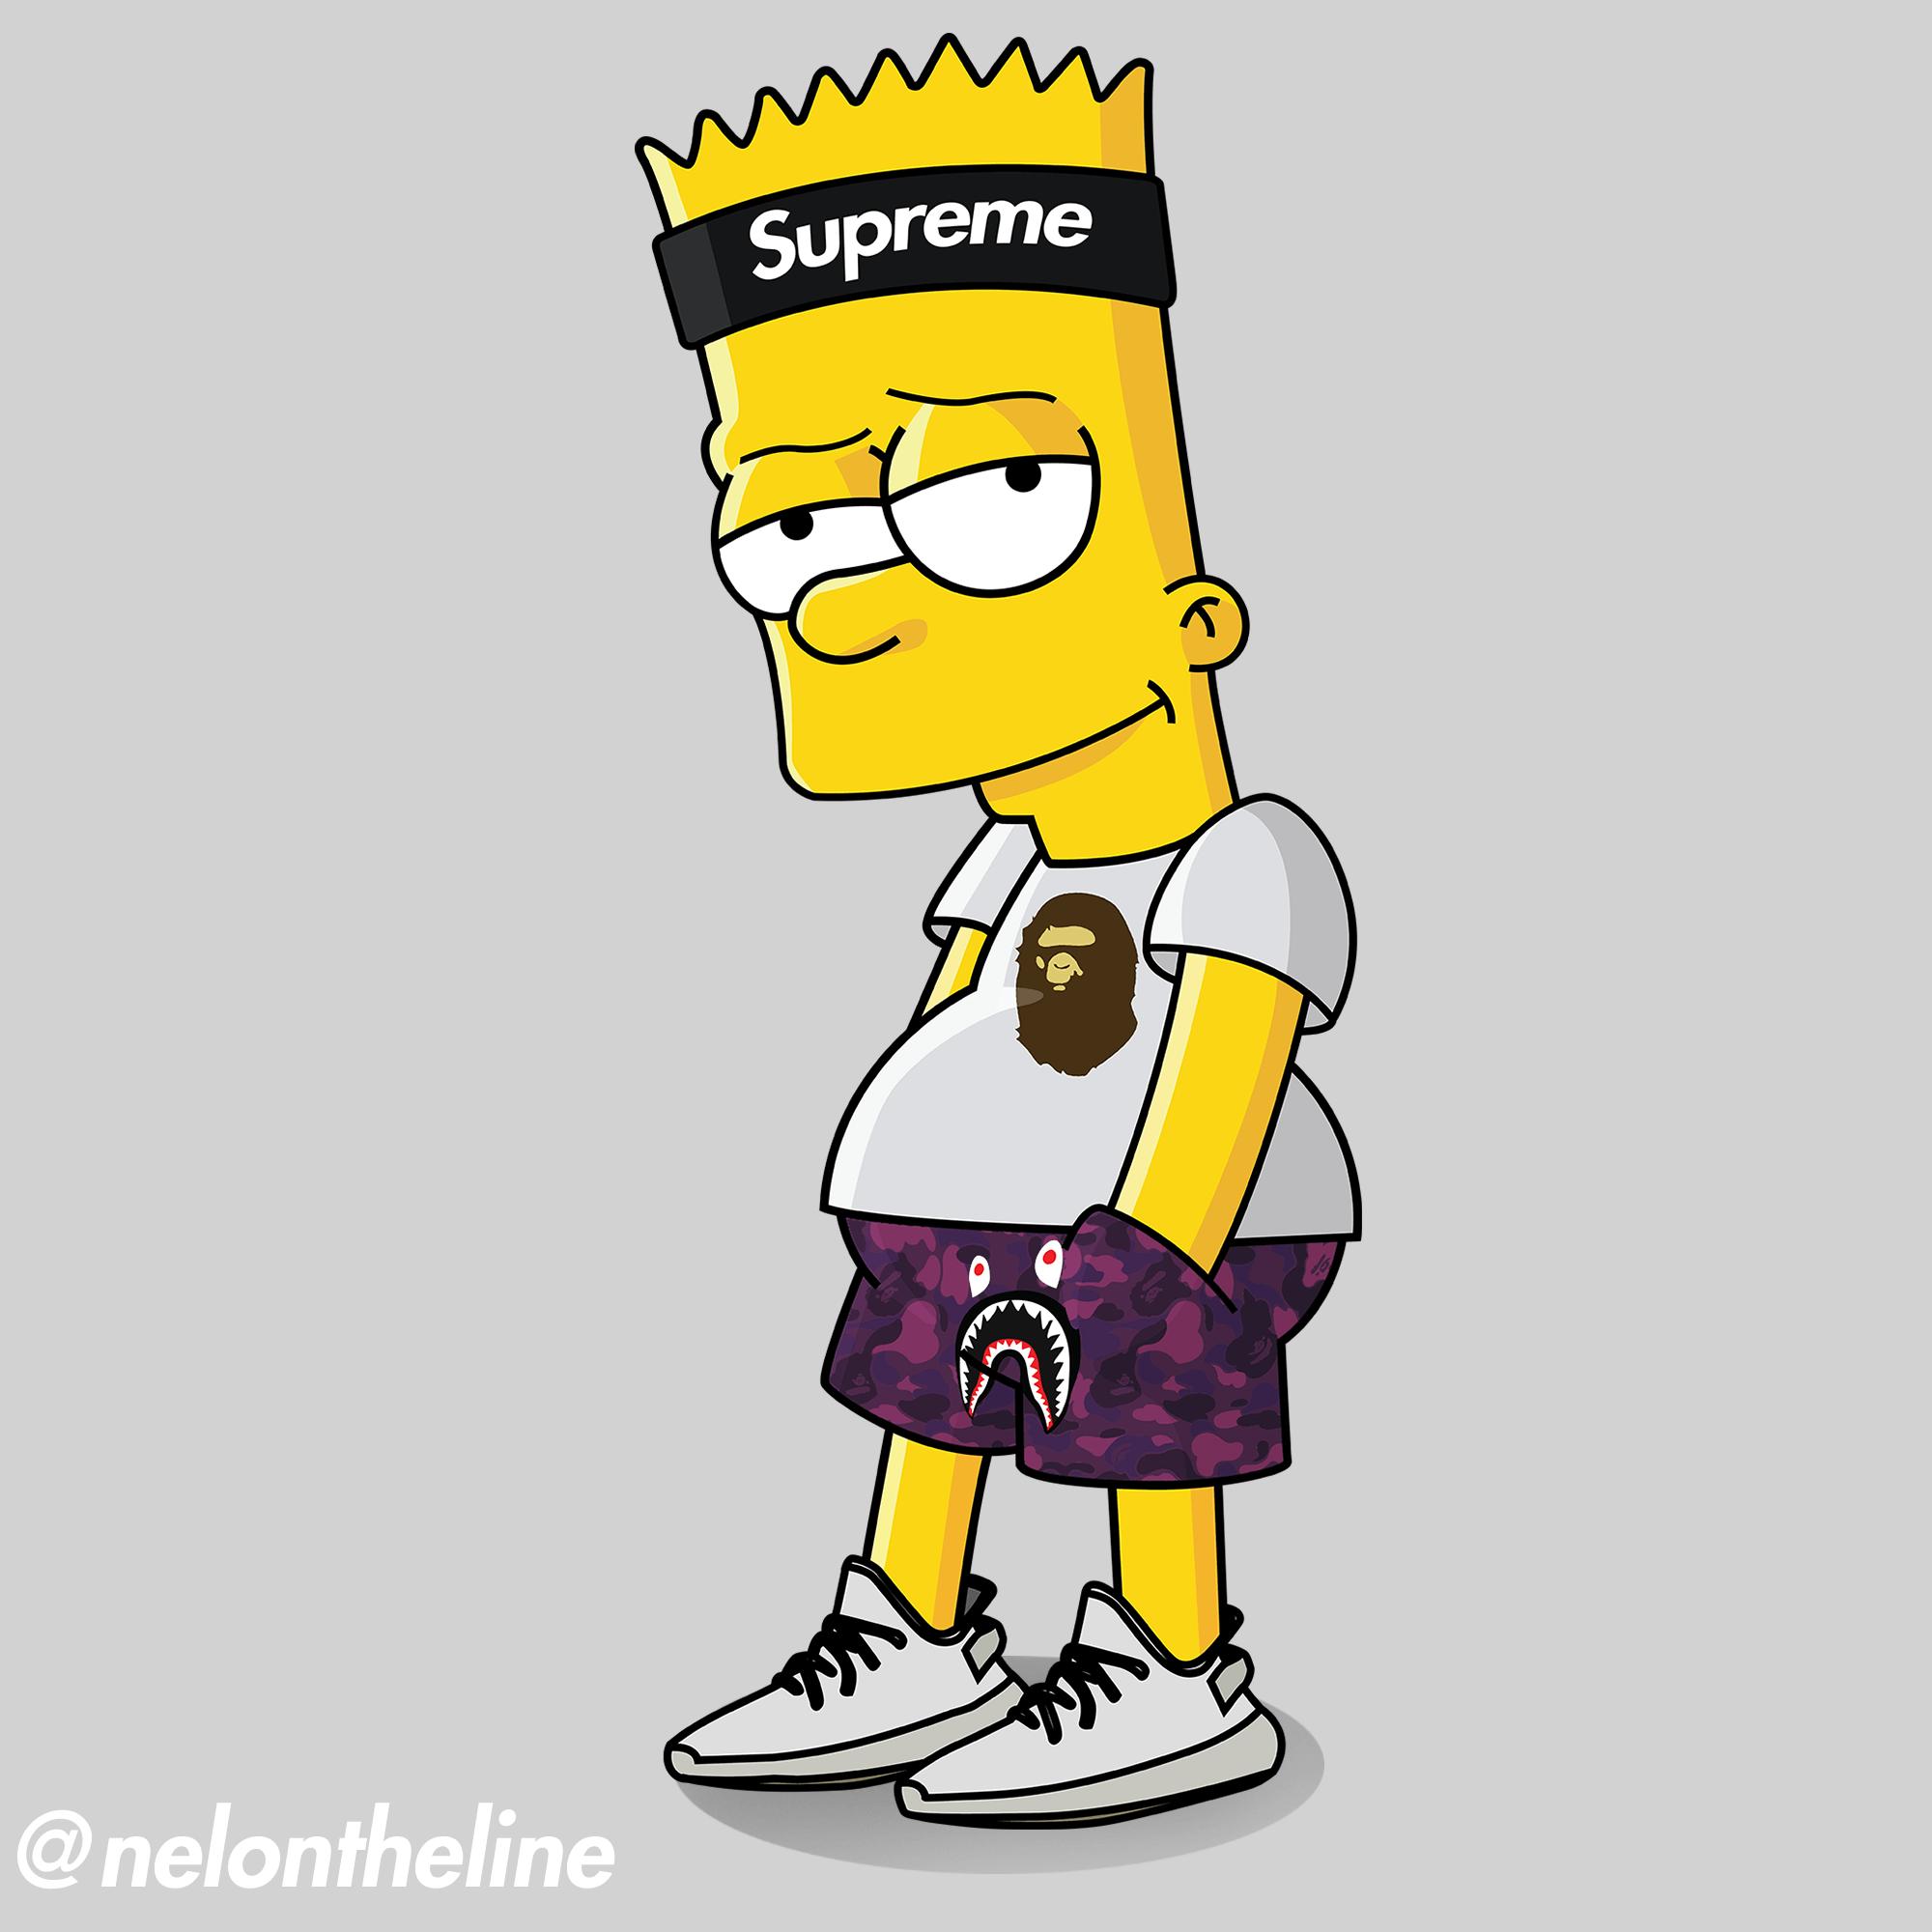 Bart Simpson Hypebeast Wallpapers Top Free Bart Simpson